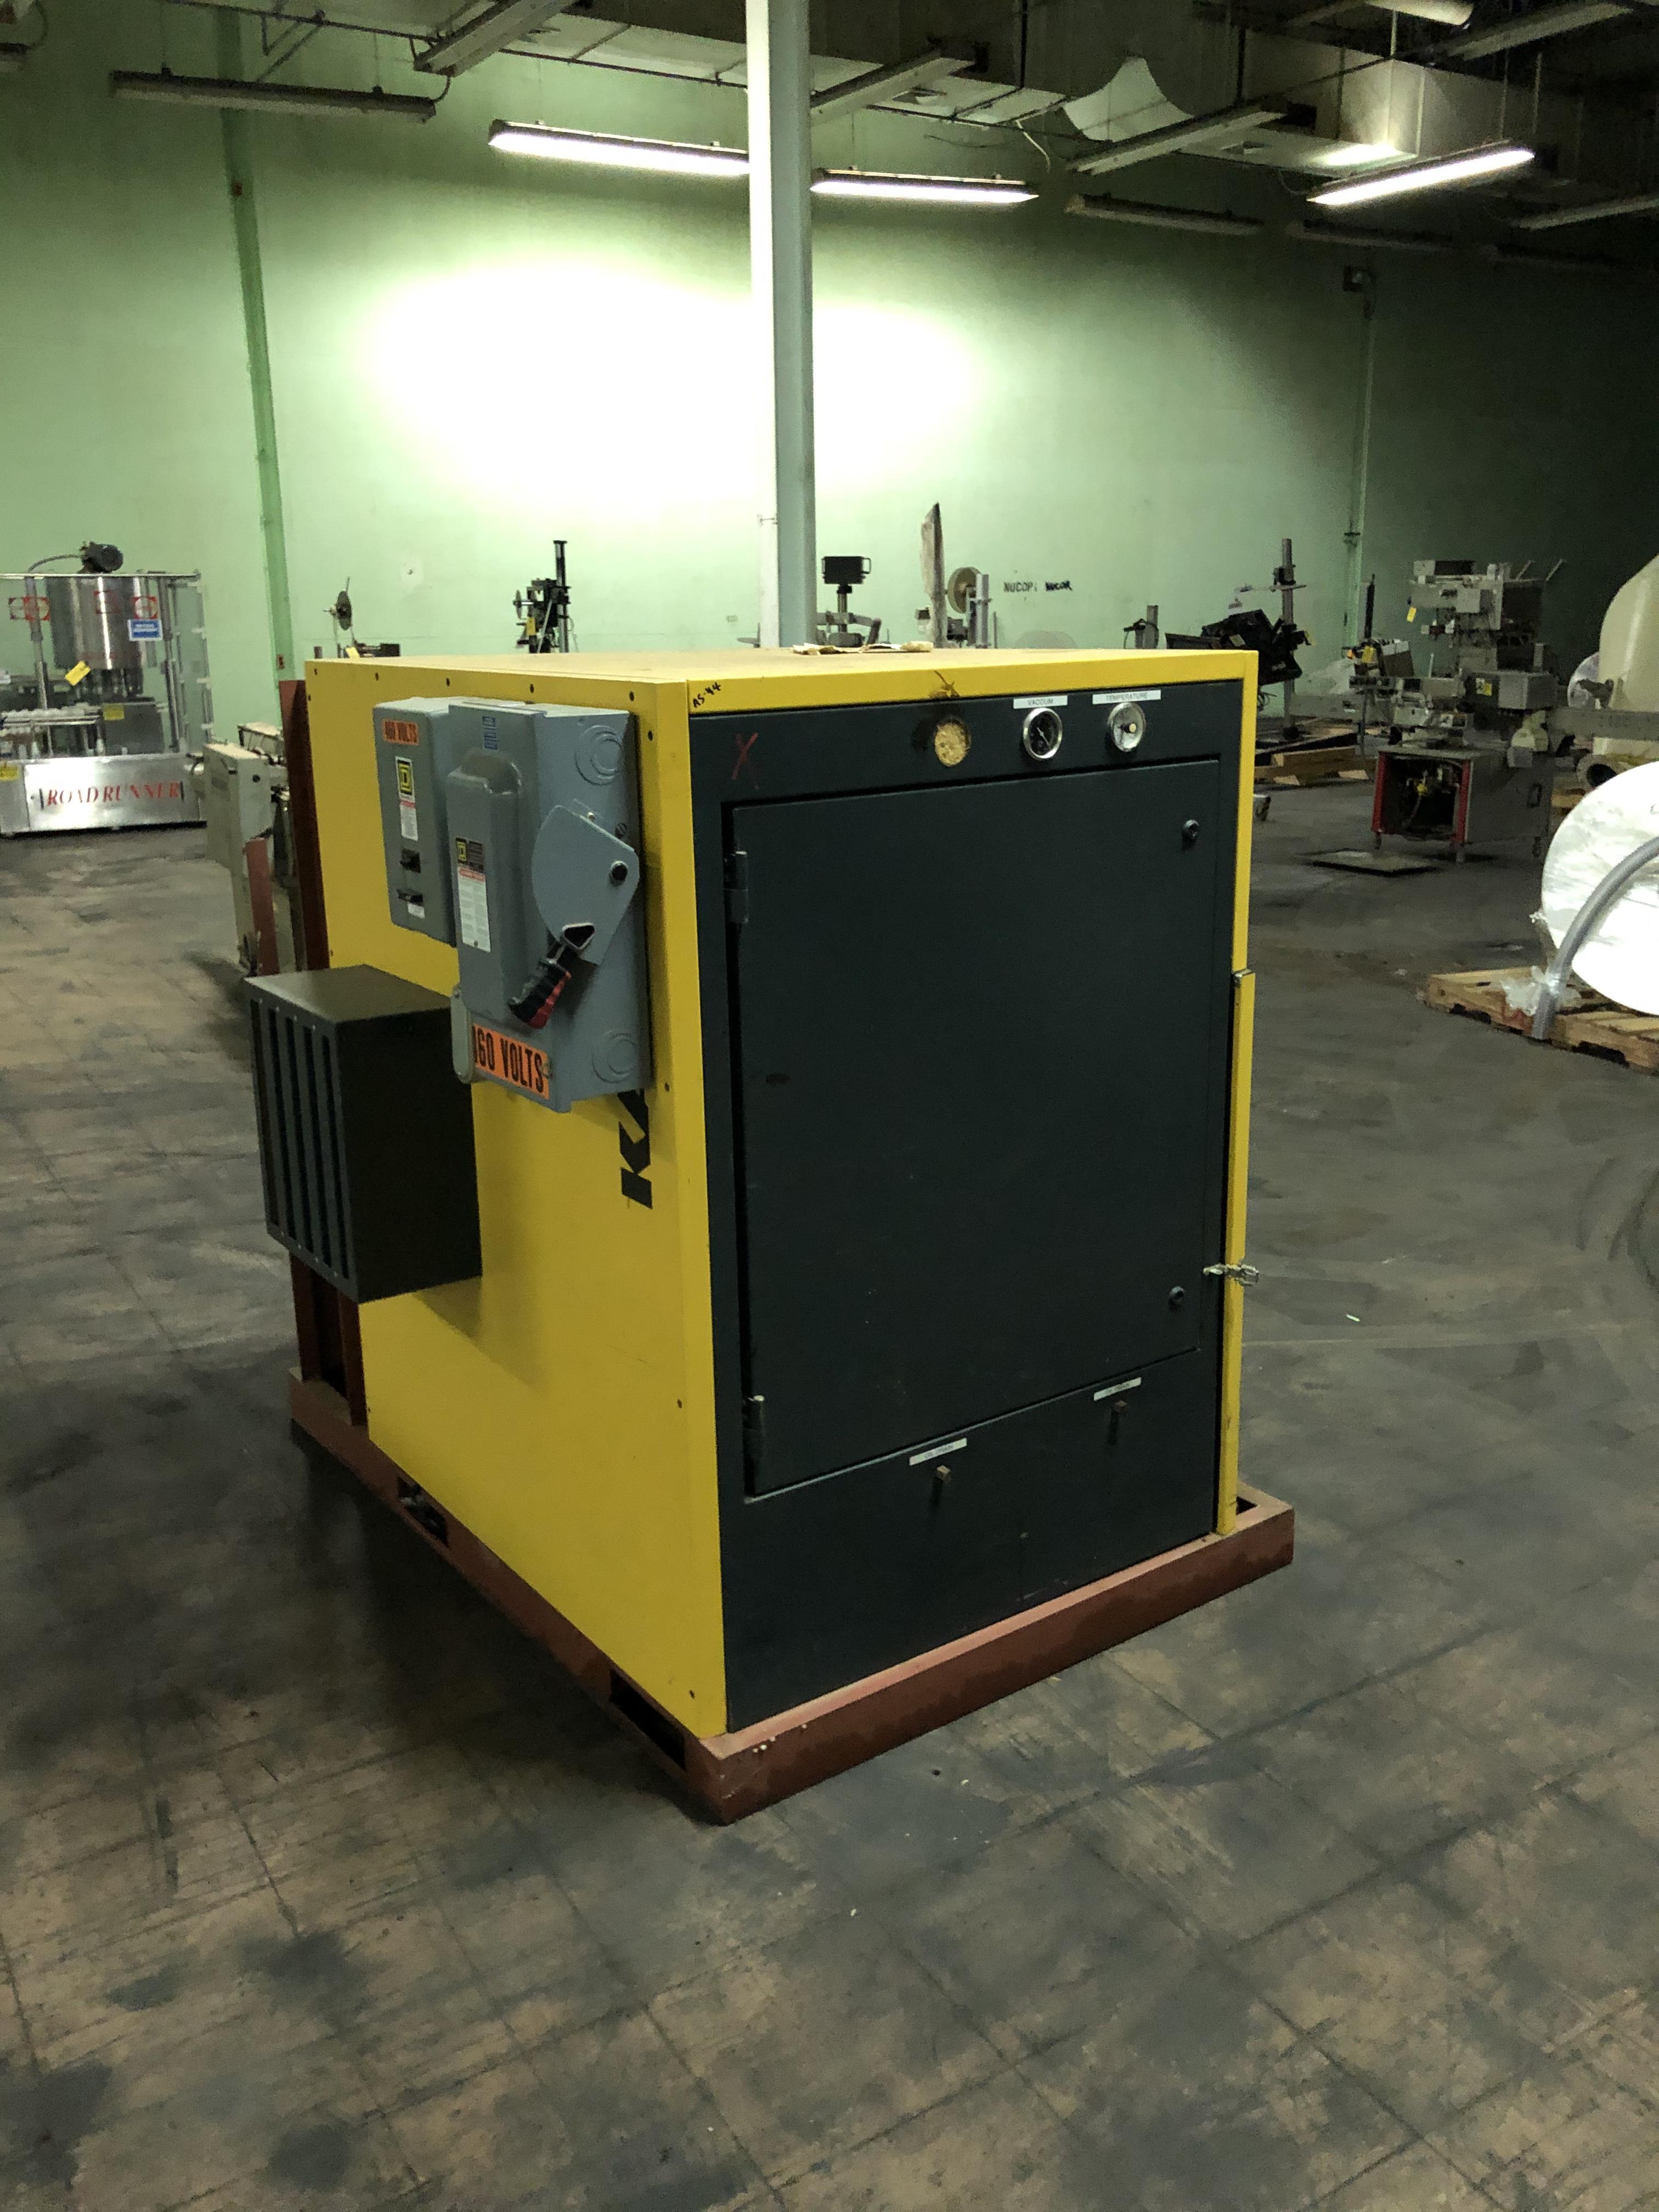 Kaeser Model #AS-44 Air Compressor, Hours N/A, RIGGING FEE - $150 - Image 2 of 2